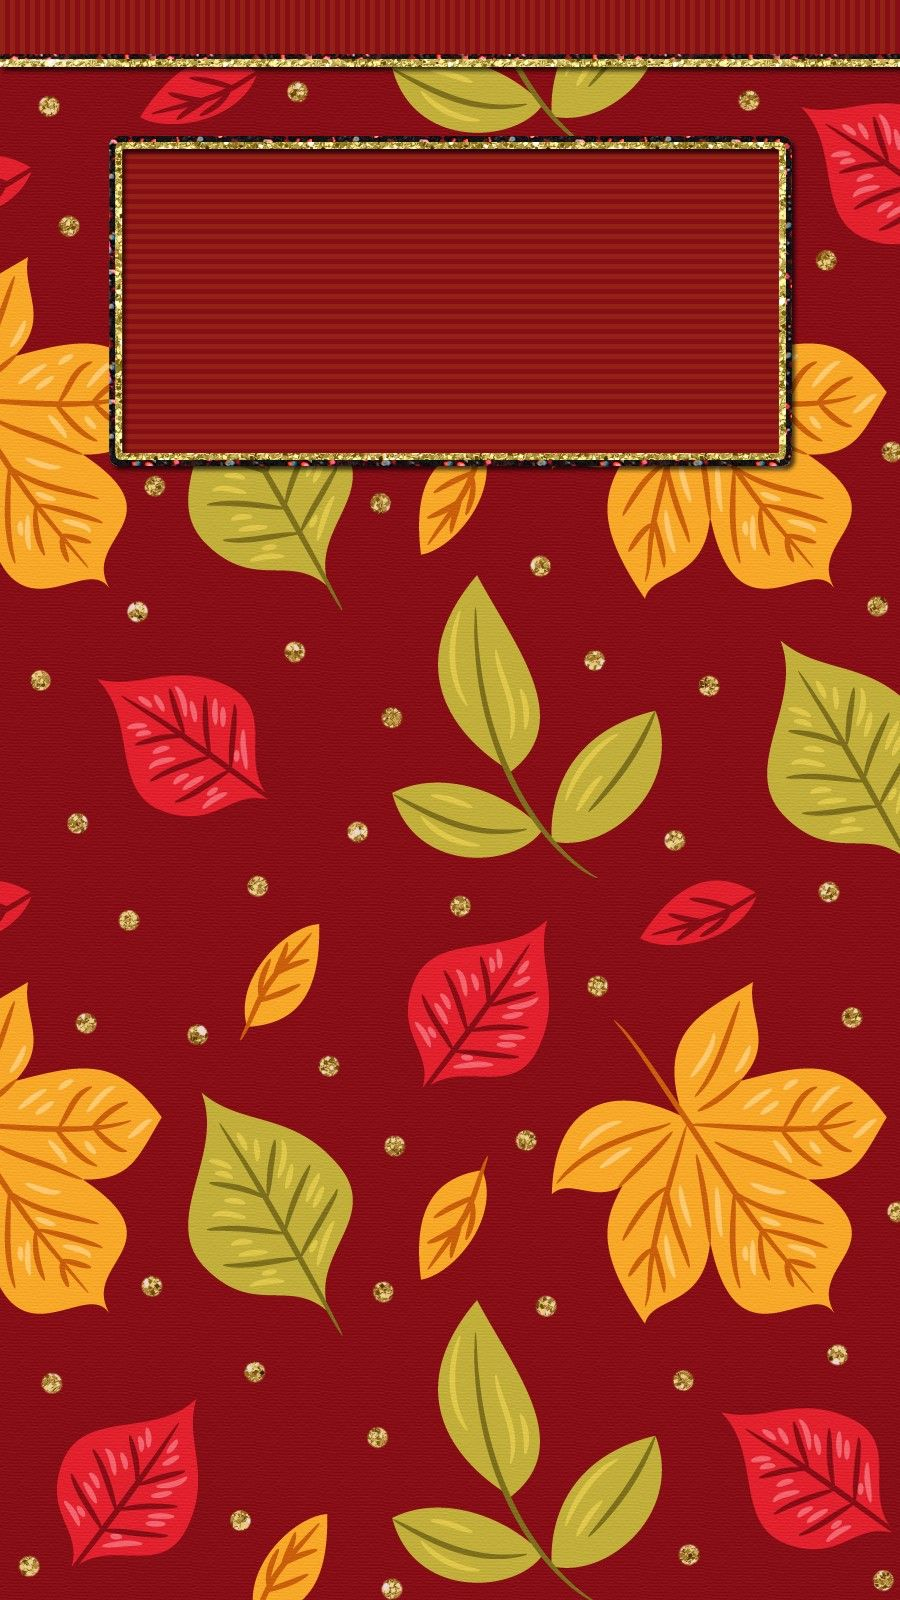 Pin By Angelmom4 On Cute Wallz Cute Fall Wallpaper Leaves Wallpaper Iphone Phone Wallpaper Design